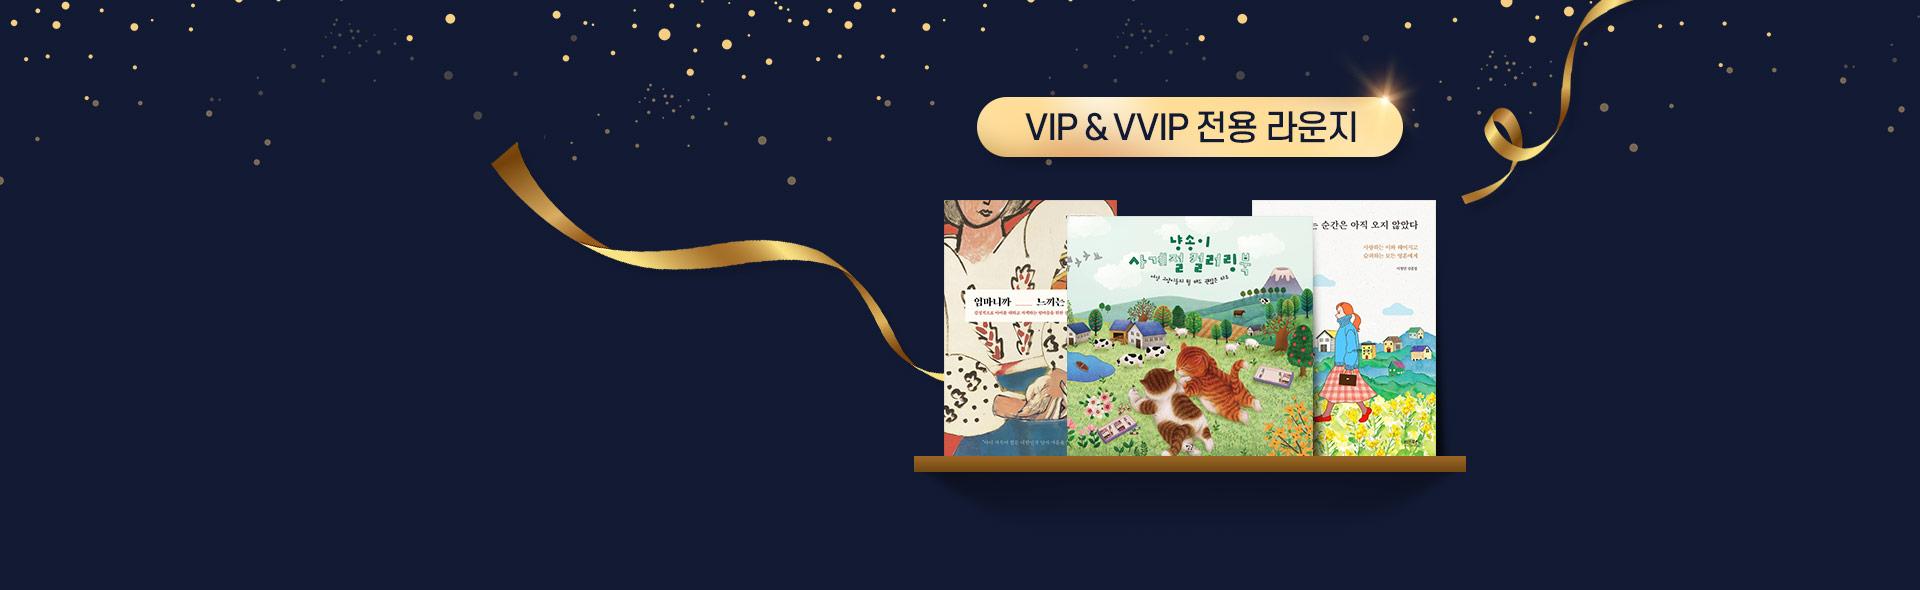 [VIP 라운지] 네오팜샵 BOOK EVENT 이미지 5